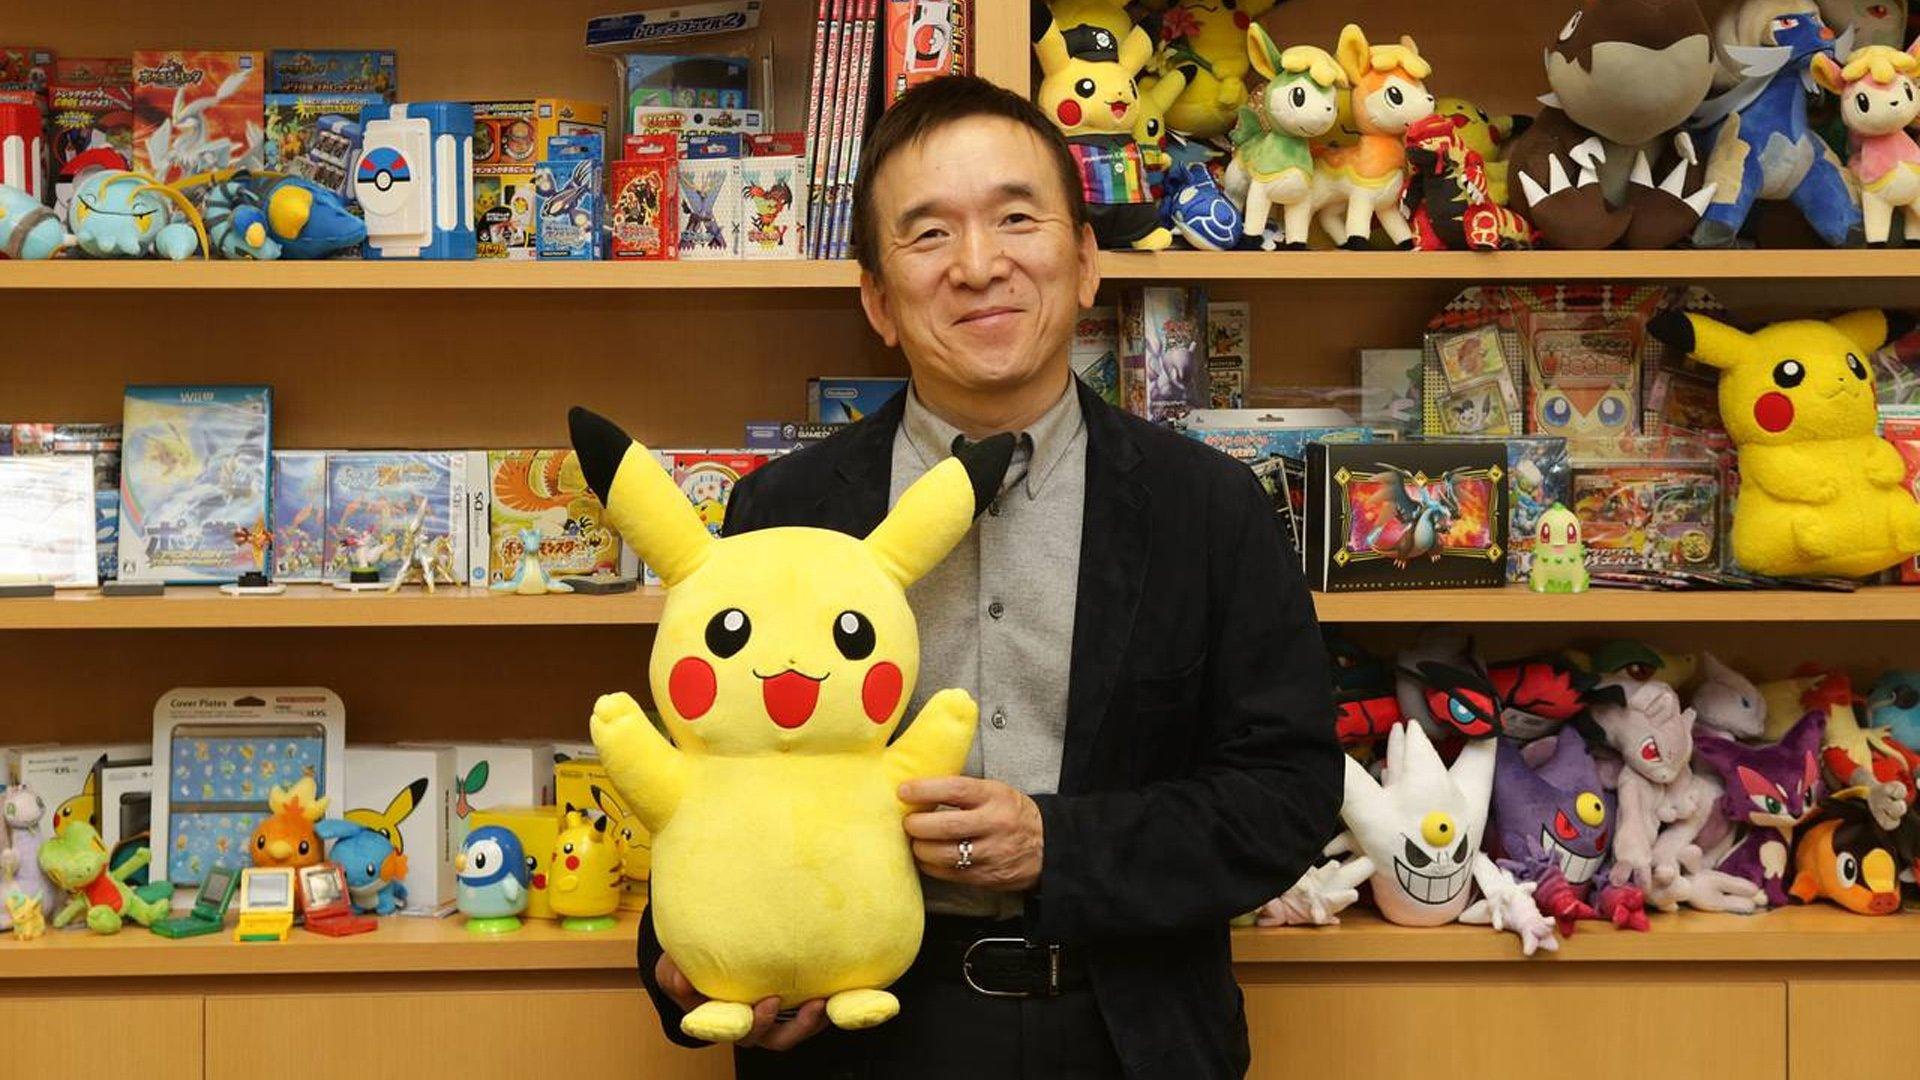 Modojo | Pokemon Company CEO Weighs In On Pokemon Go's Biggest Hurdles